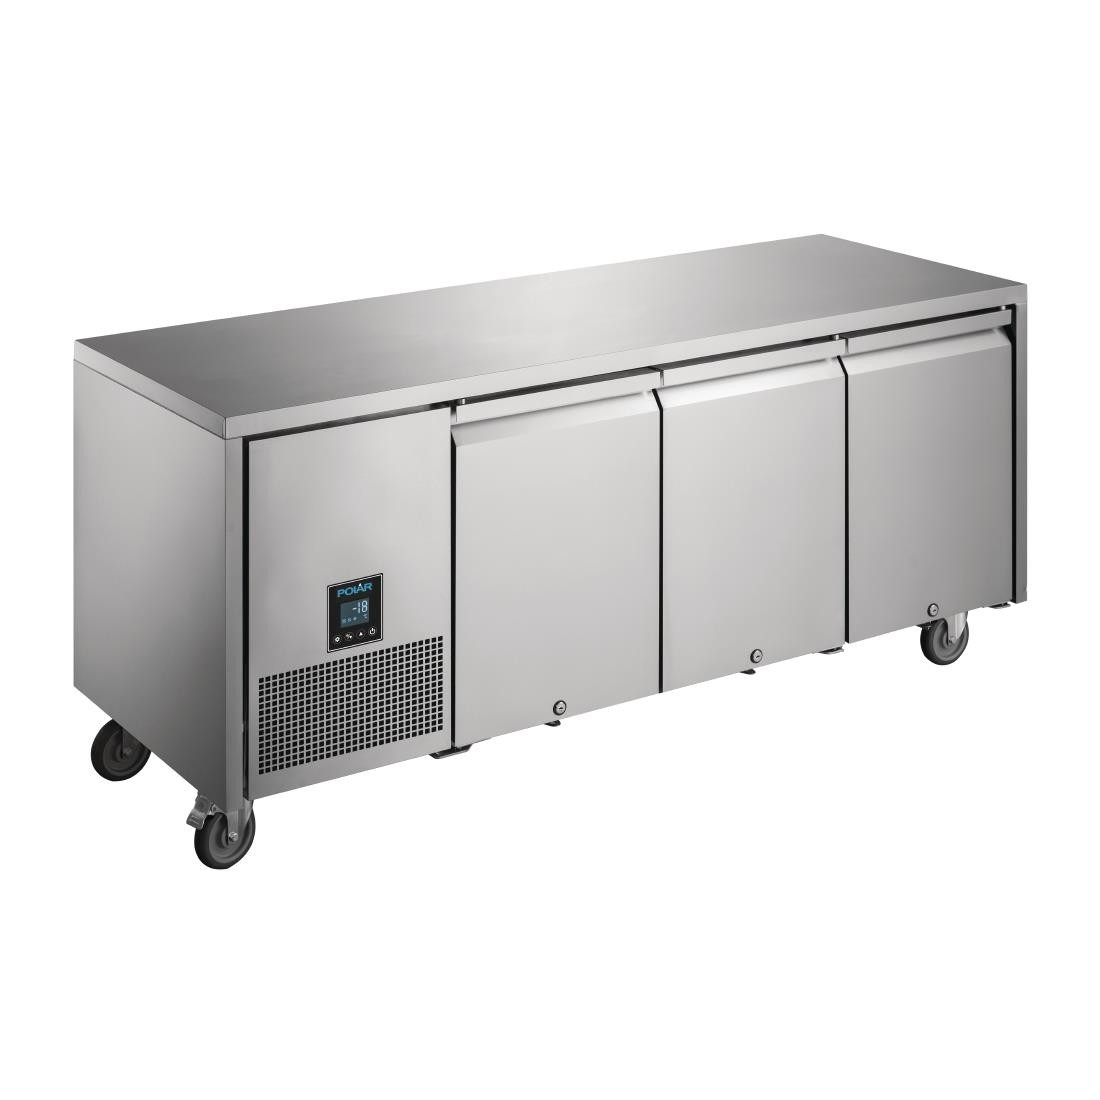 Polar UA008 U-Series Premium Triple Door Counter Freezer